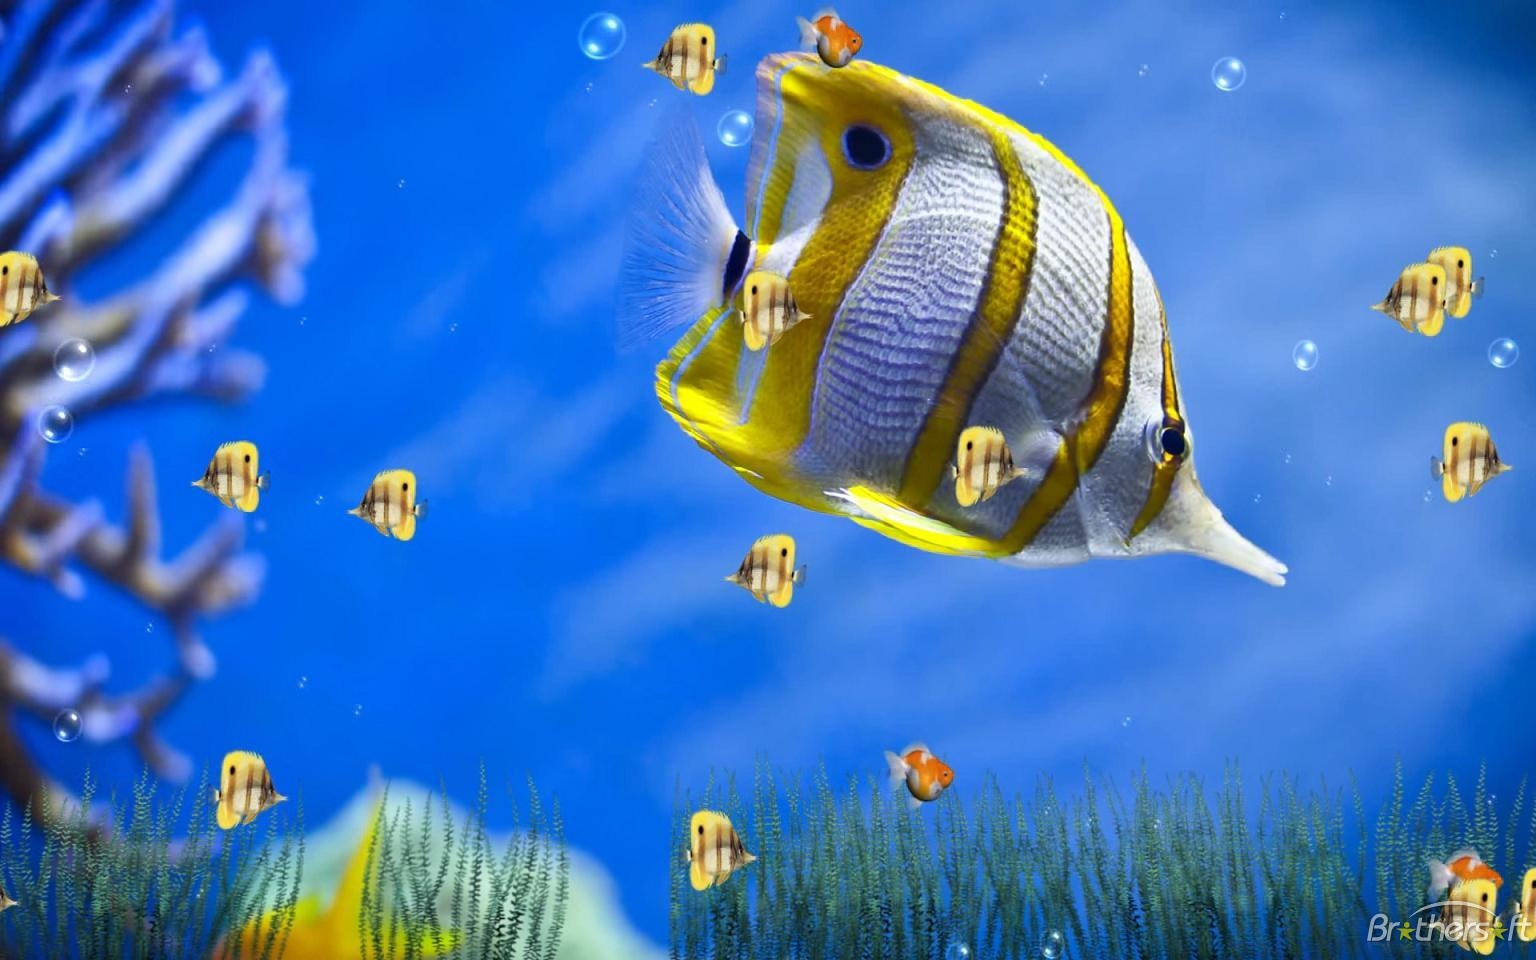 Animated Wallpaper Marine Life Aquarium Animated Wallpaper 10 1536x960